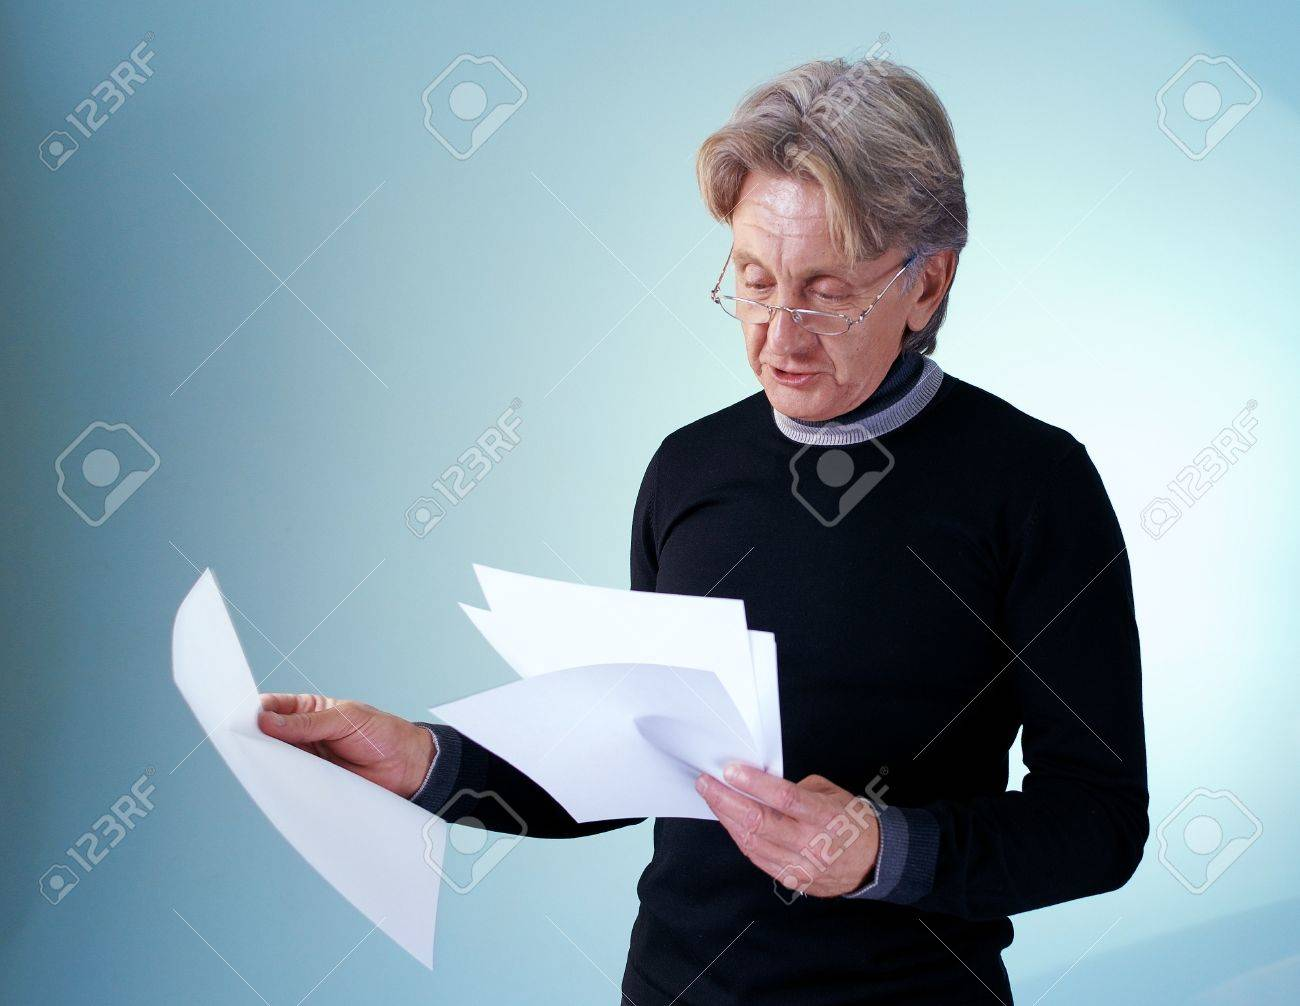 Senior papers